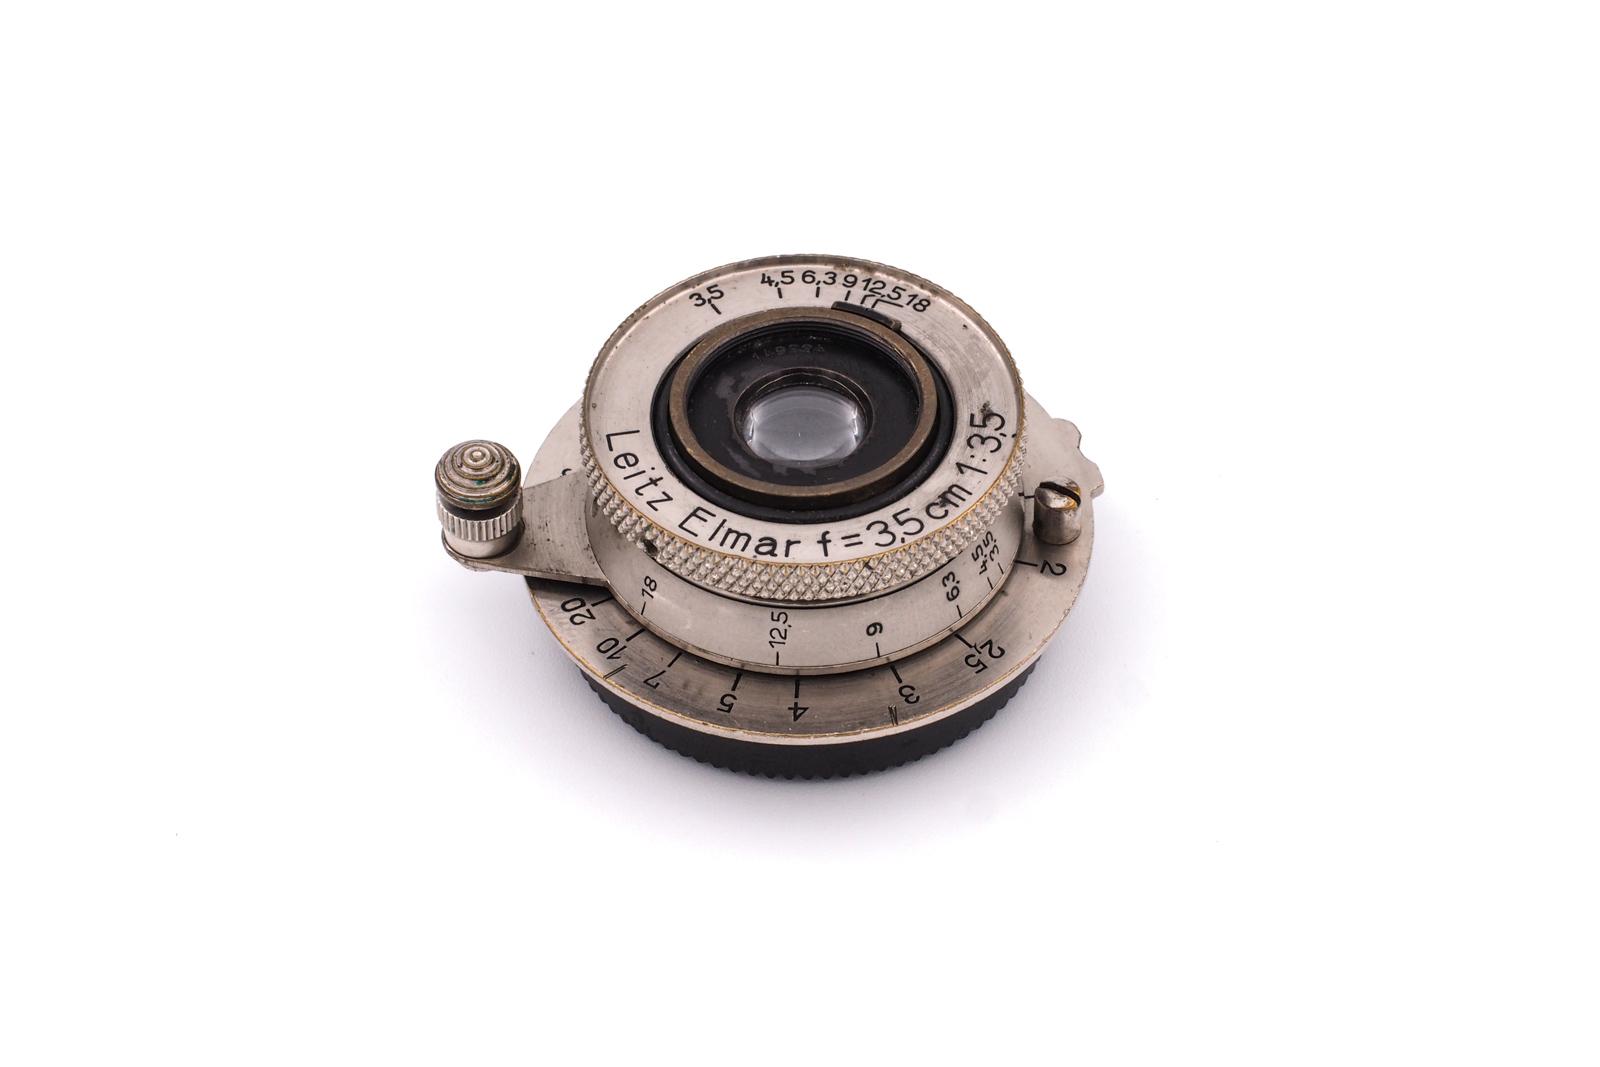 "Leitz Elmar 1:3.5/3.5cm nickel ""heavy cam"""